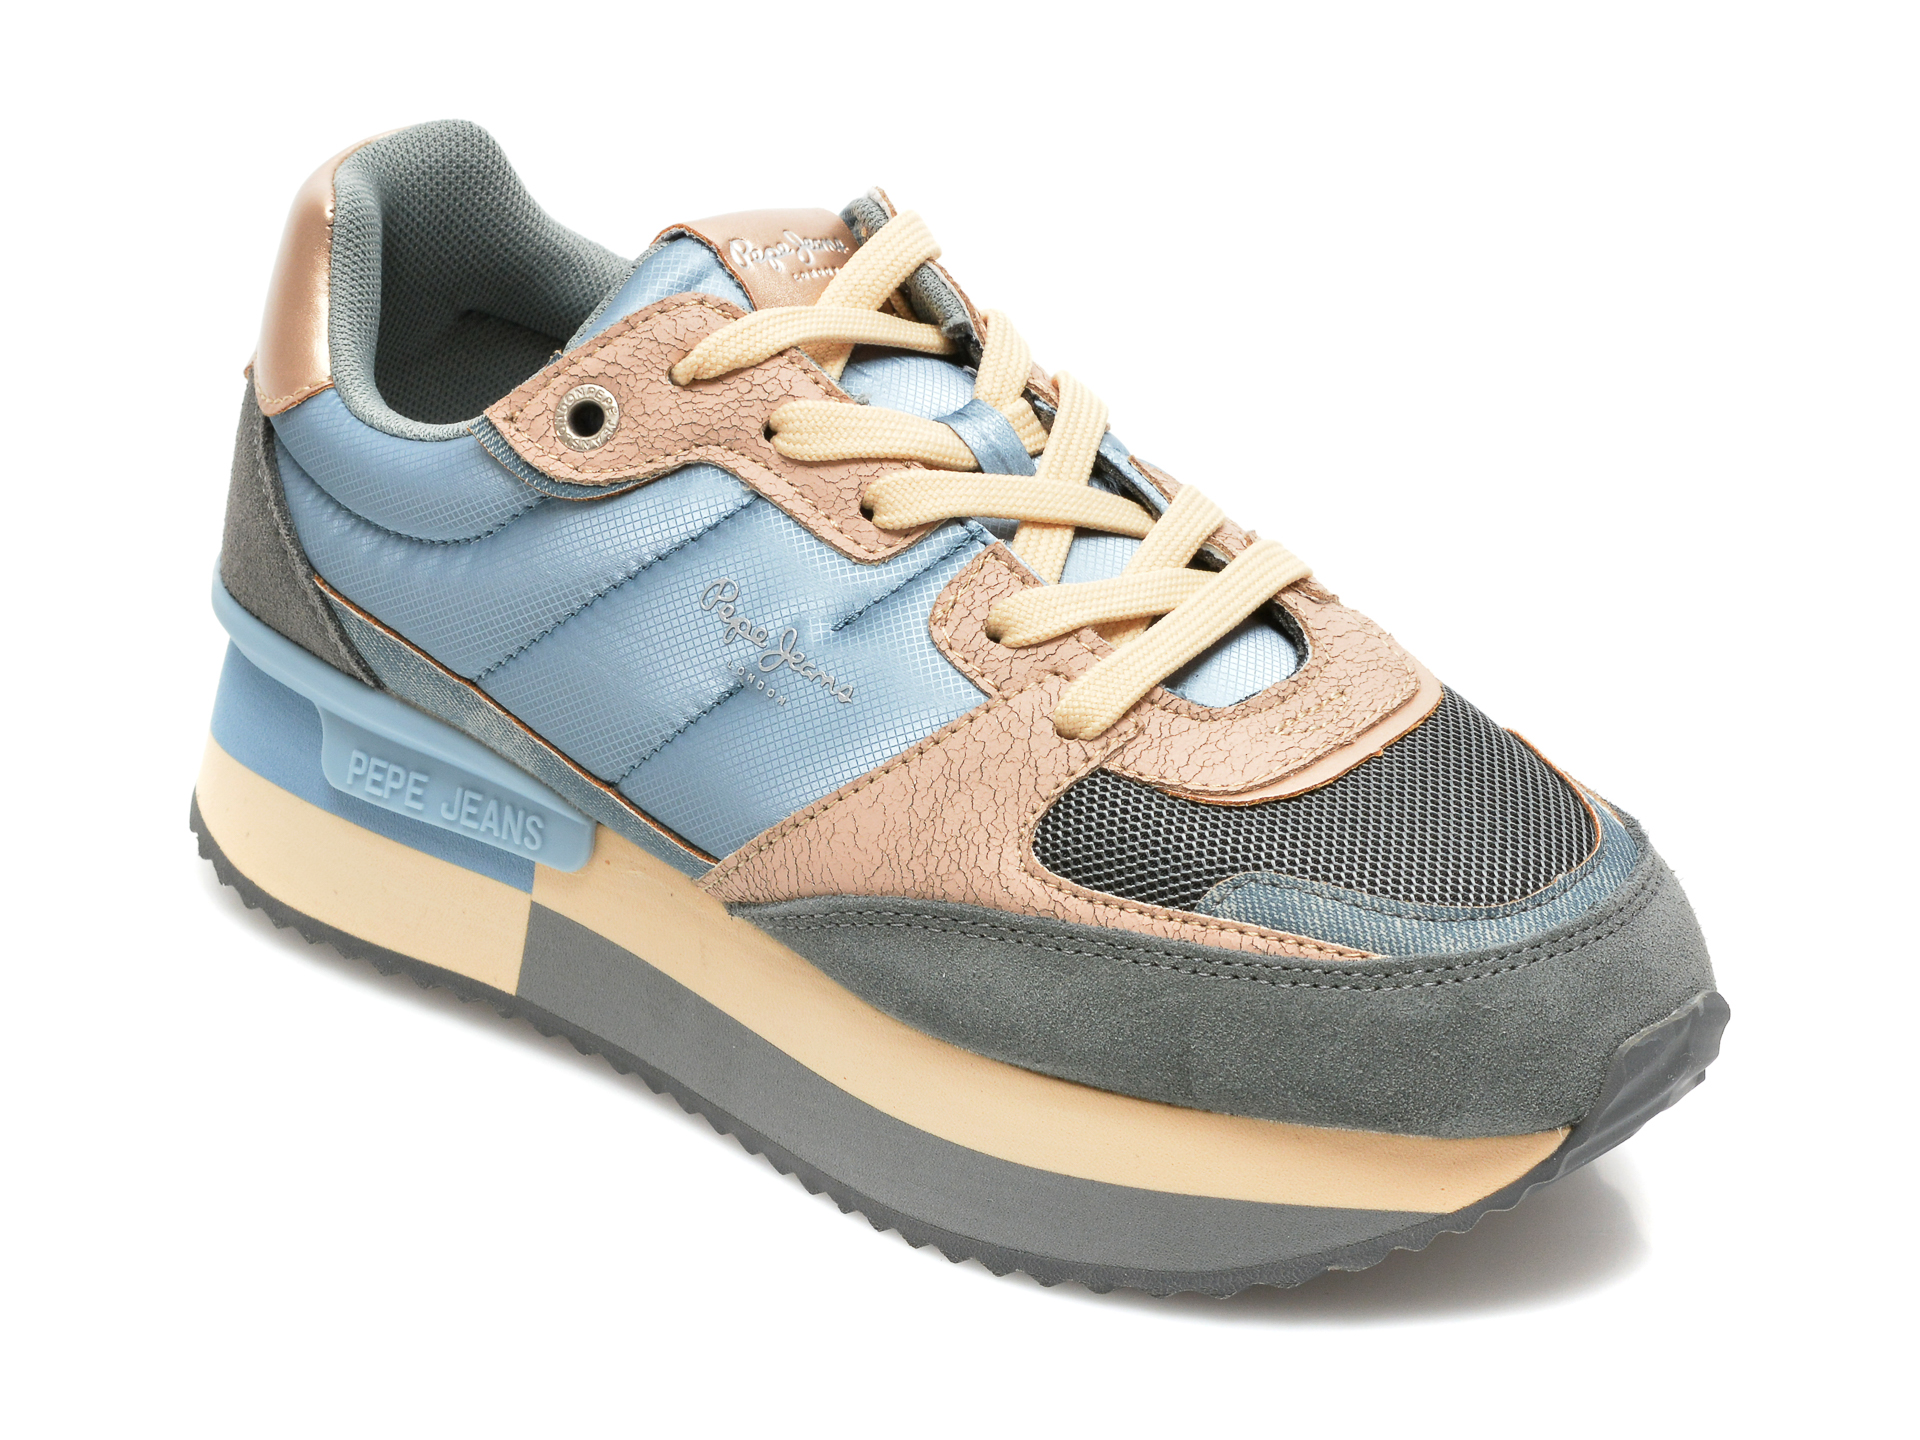 Pantofi sport PEPE JEANS albastri, LS31259, din material textil si piele naturala